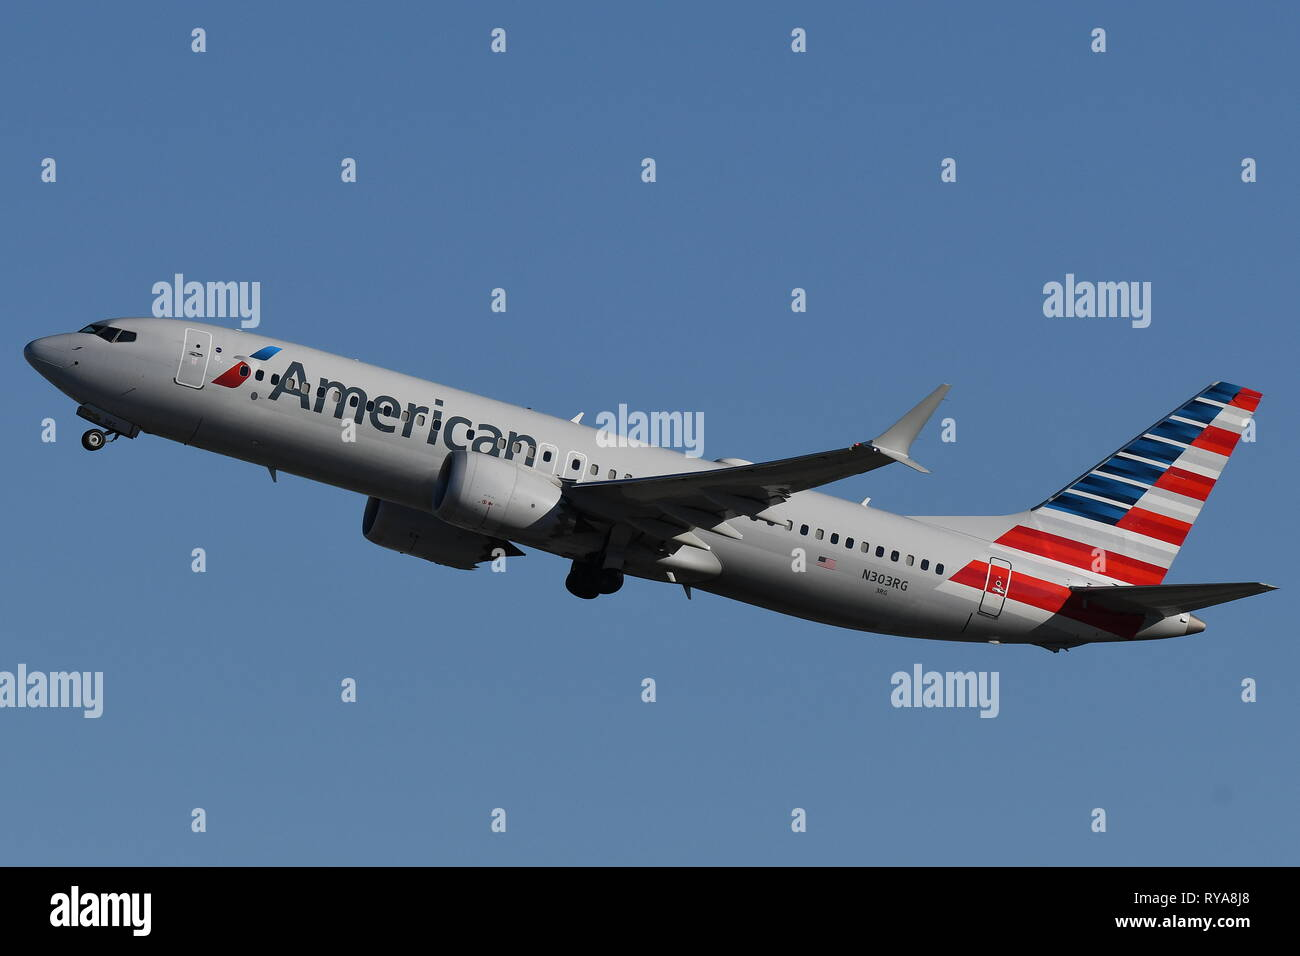 BOEING 737-MAX8 (N303RG) OF AMERICAN AIRLINES - Stock Image